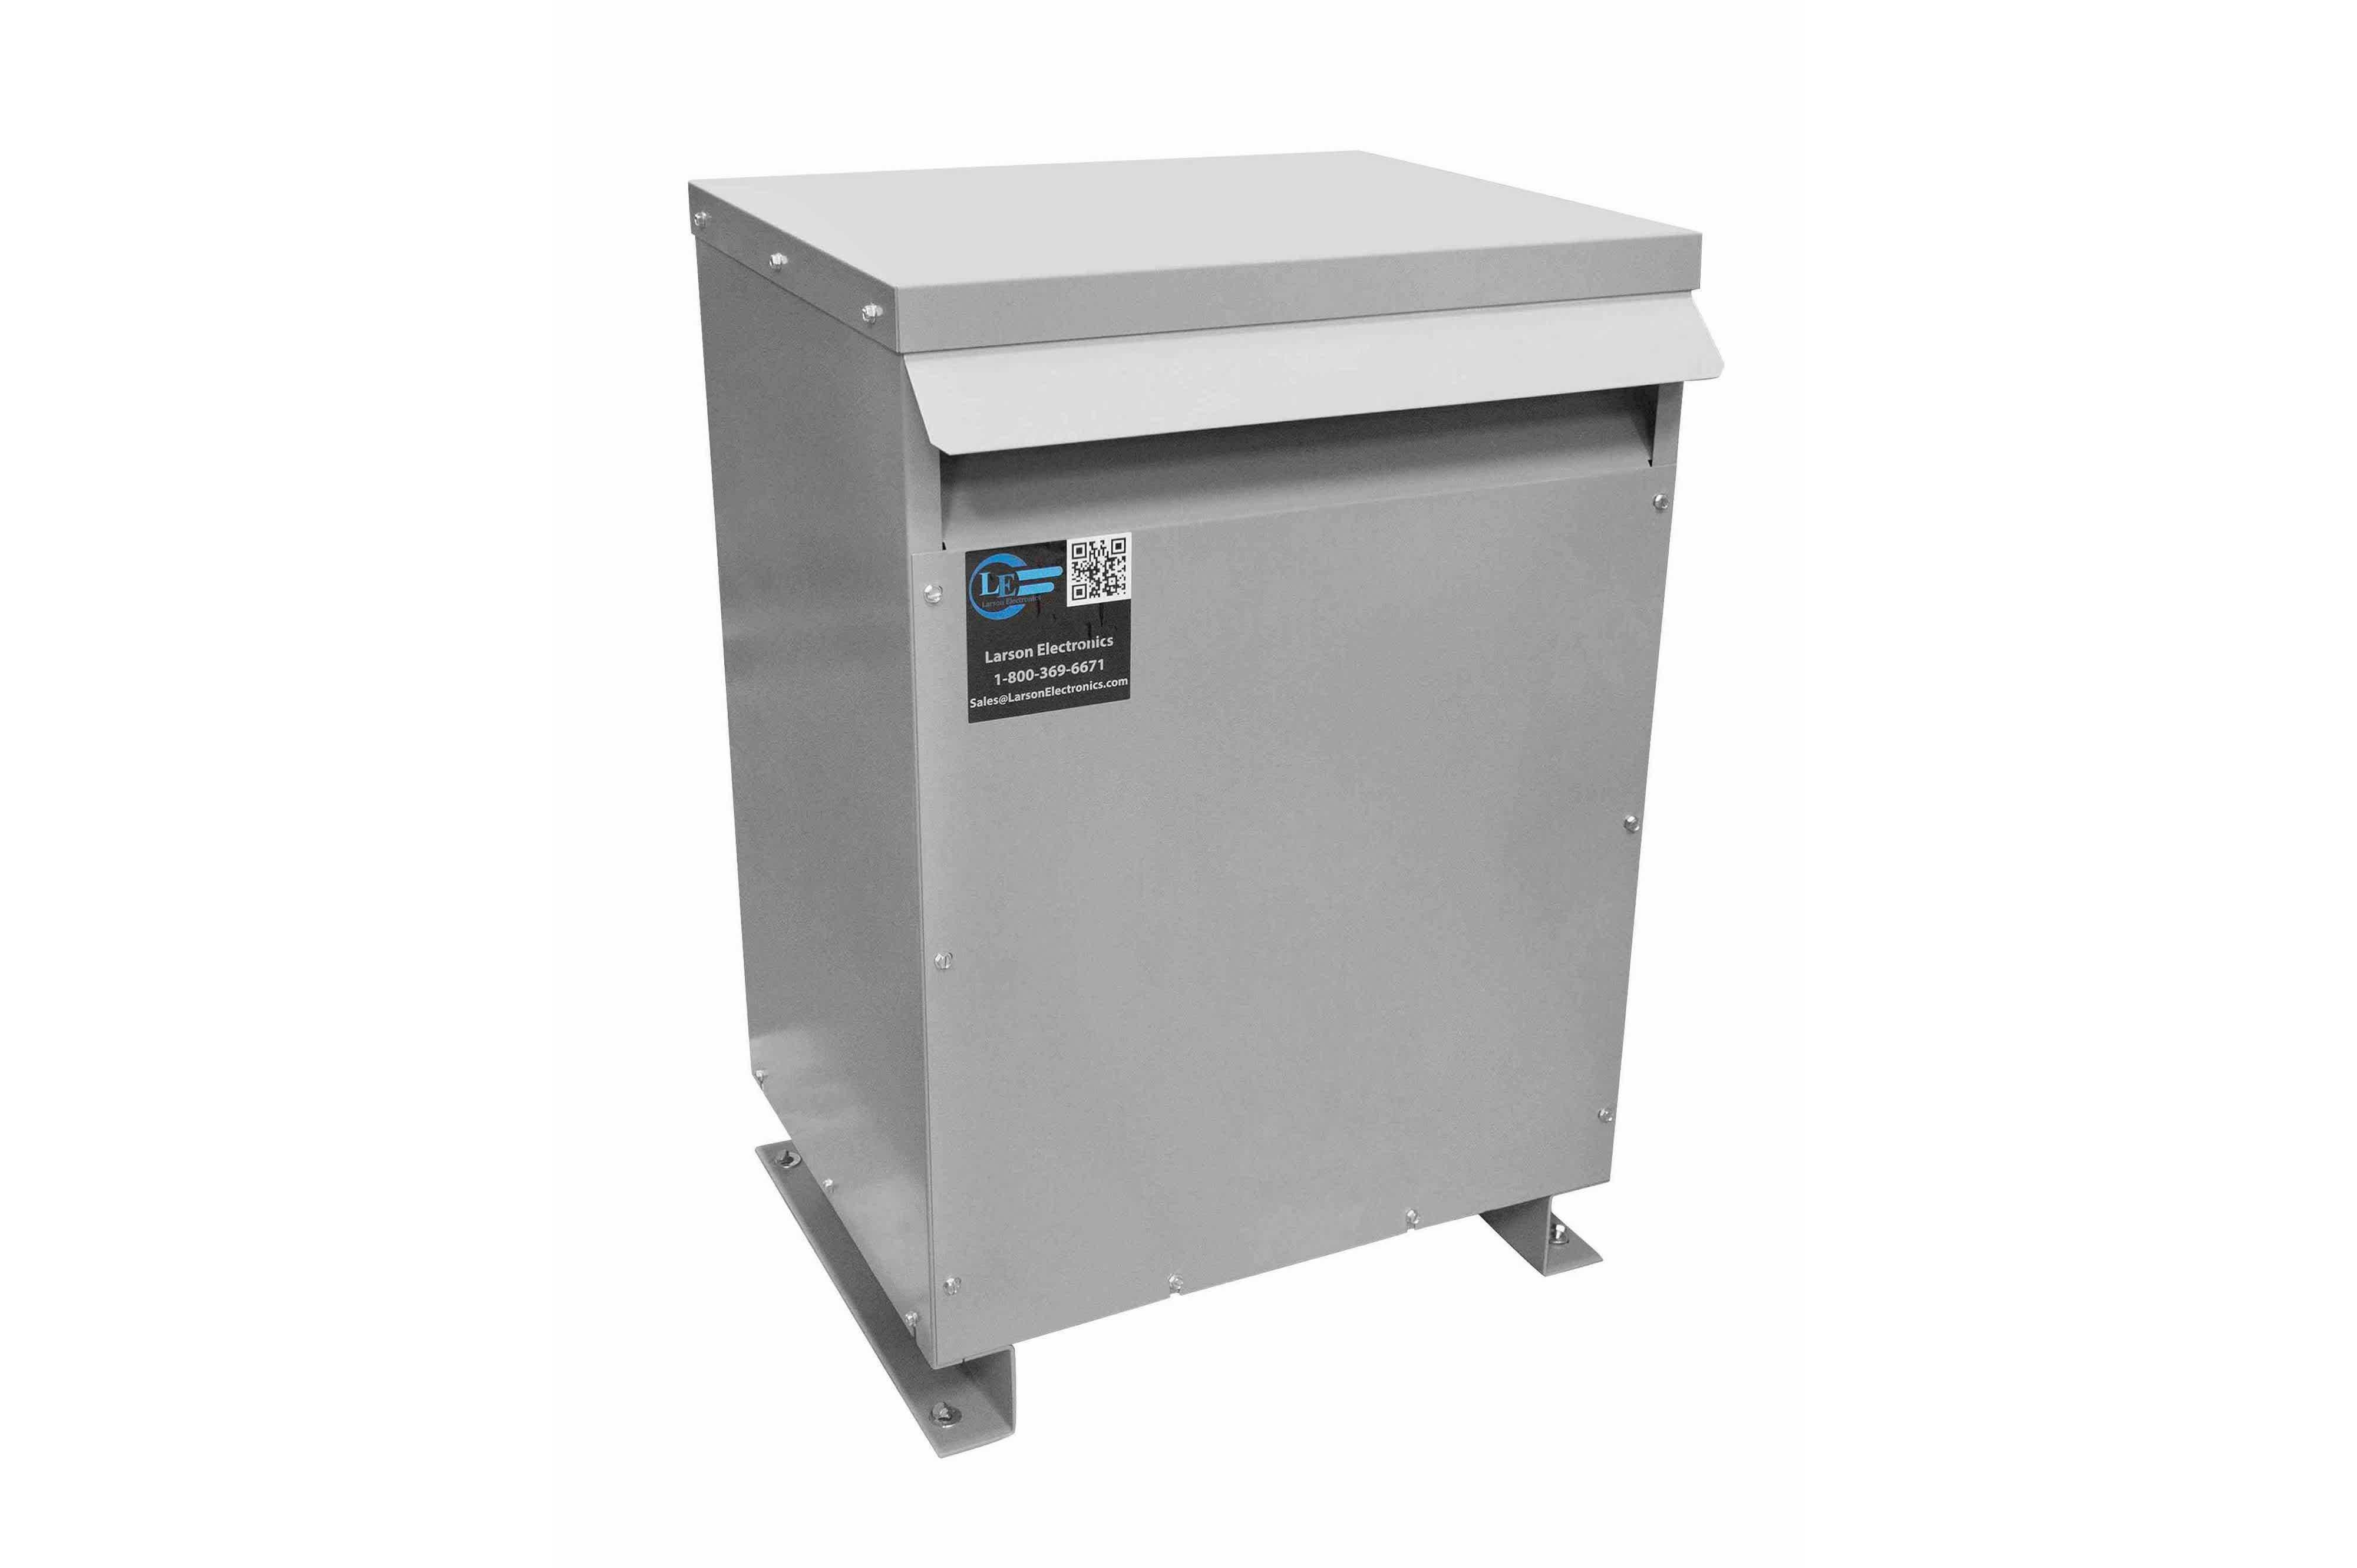 36 kVA 3PH Isolation Transformer, 415V Wye Primary, 208Y/120 Wye-N Secondary, N3R, Ventilated, 60 Hz